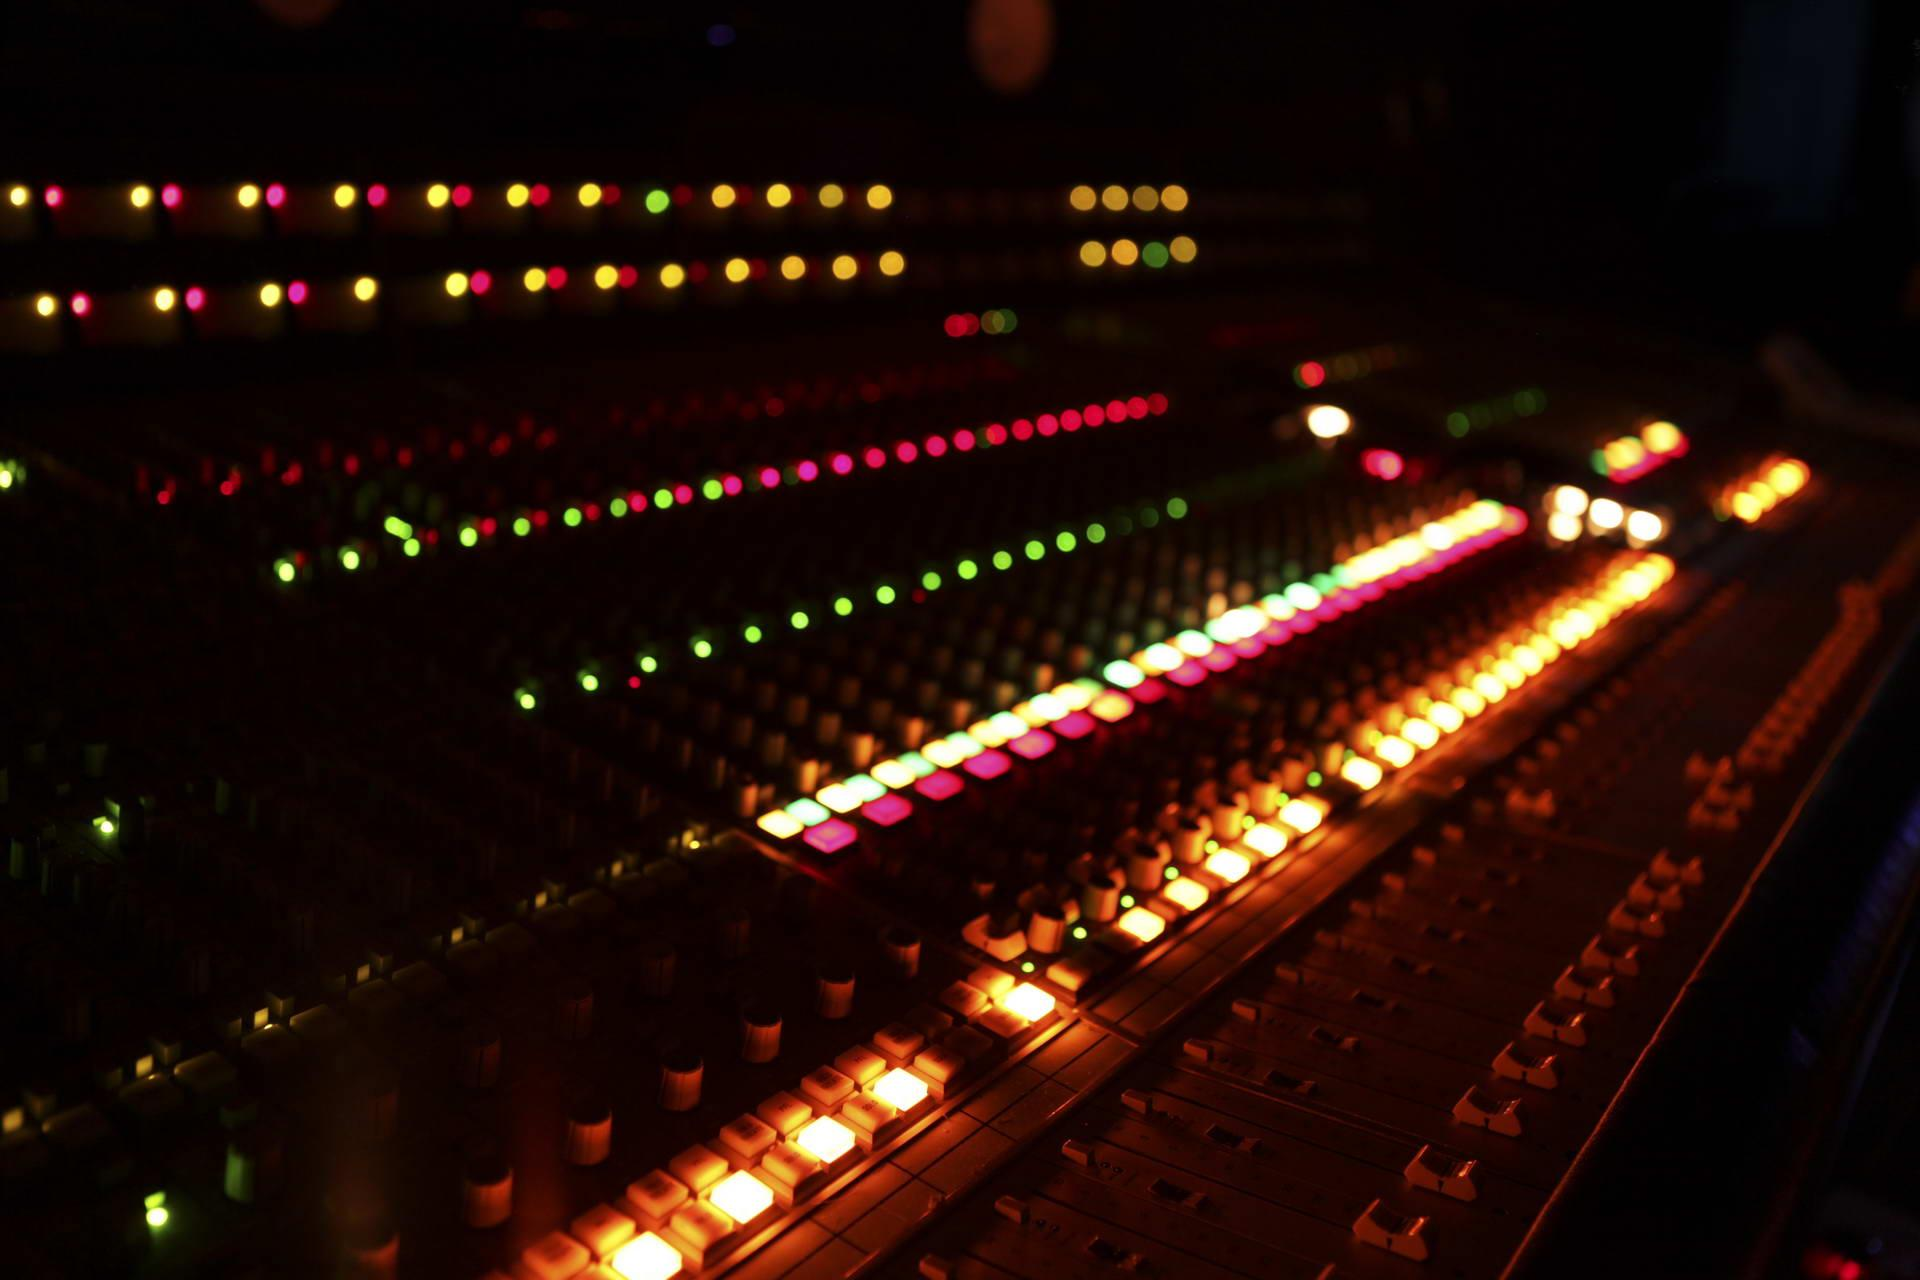 Recording Studio Wallpapers 1920x1280